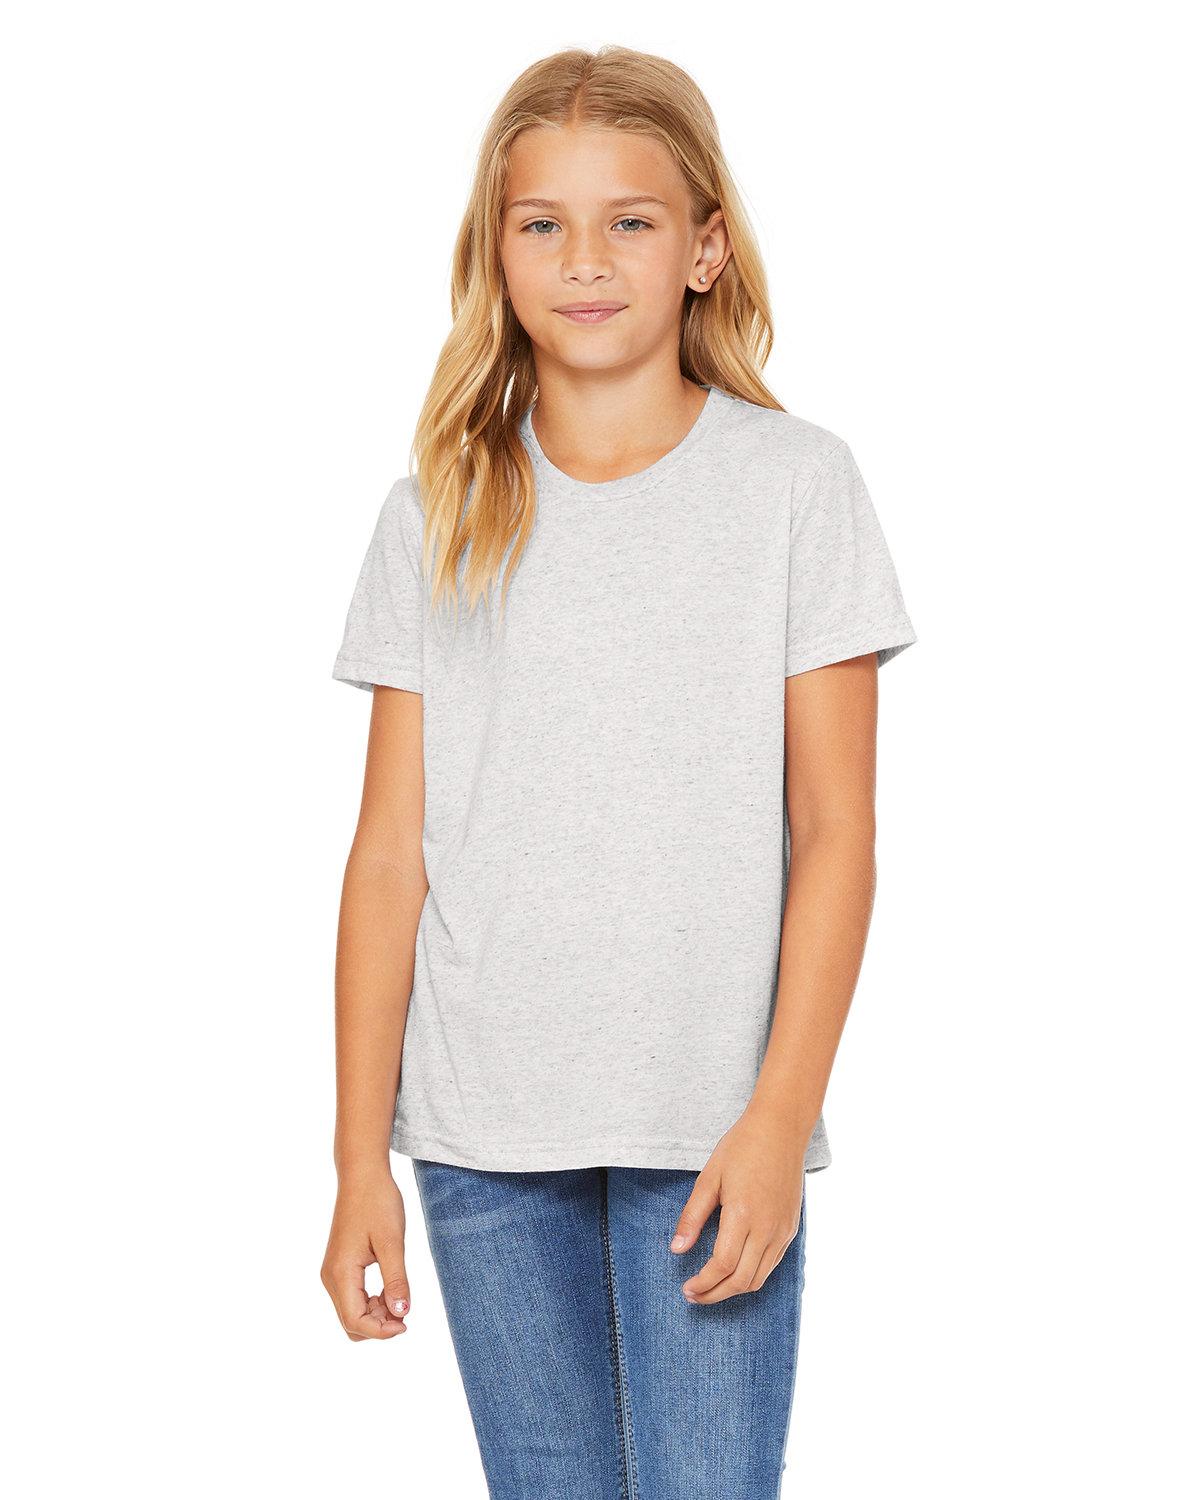 Bella + Canvas Youth Triblend Short-Sleeve T-Shirt WHITE FLK TRBLND